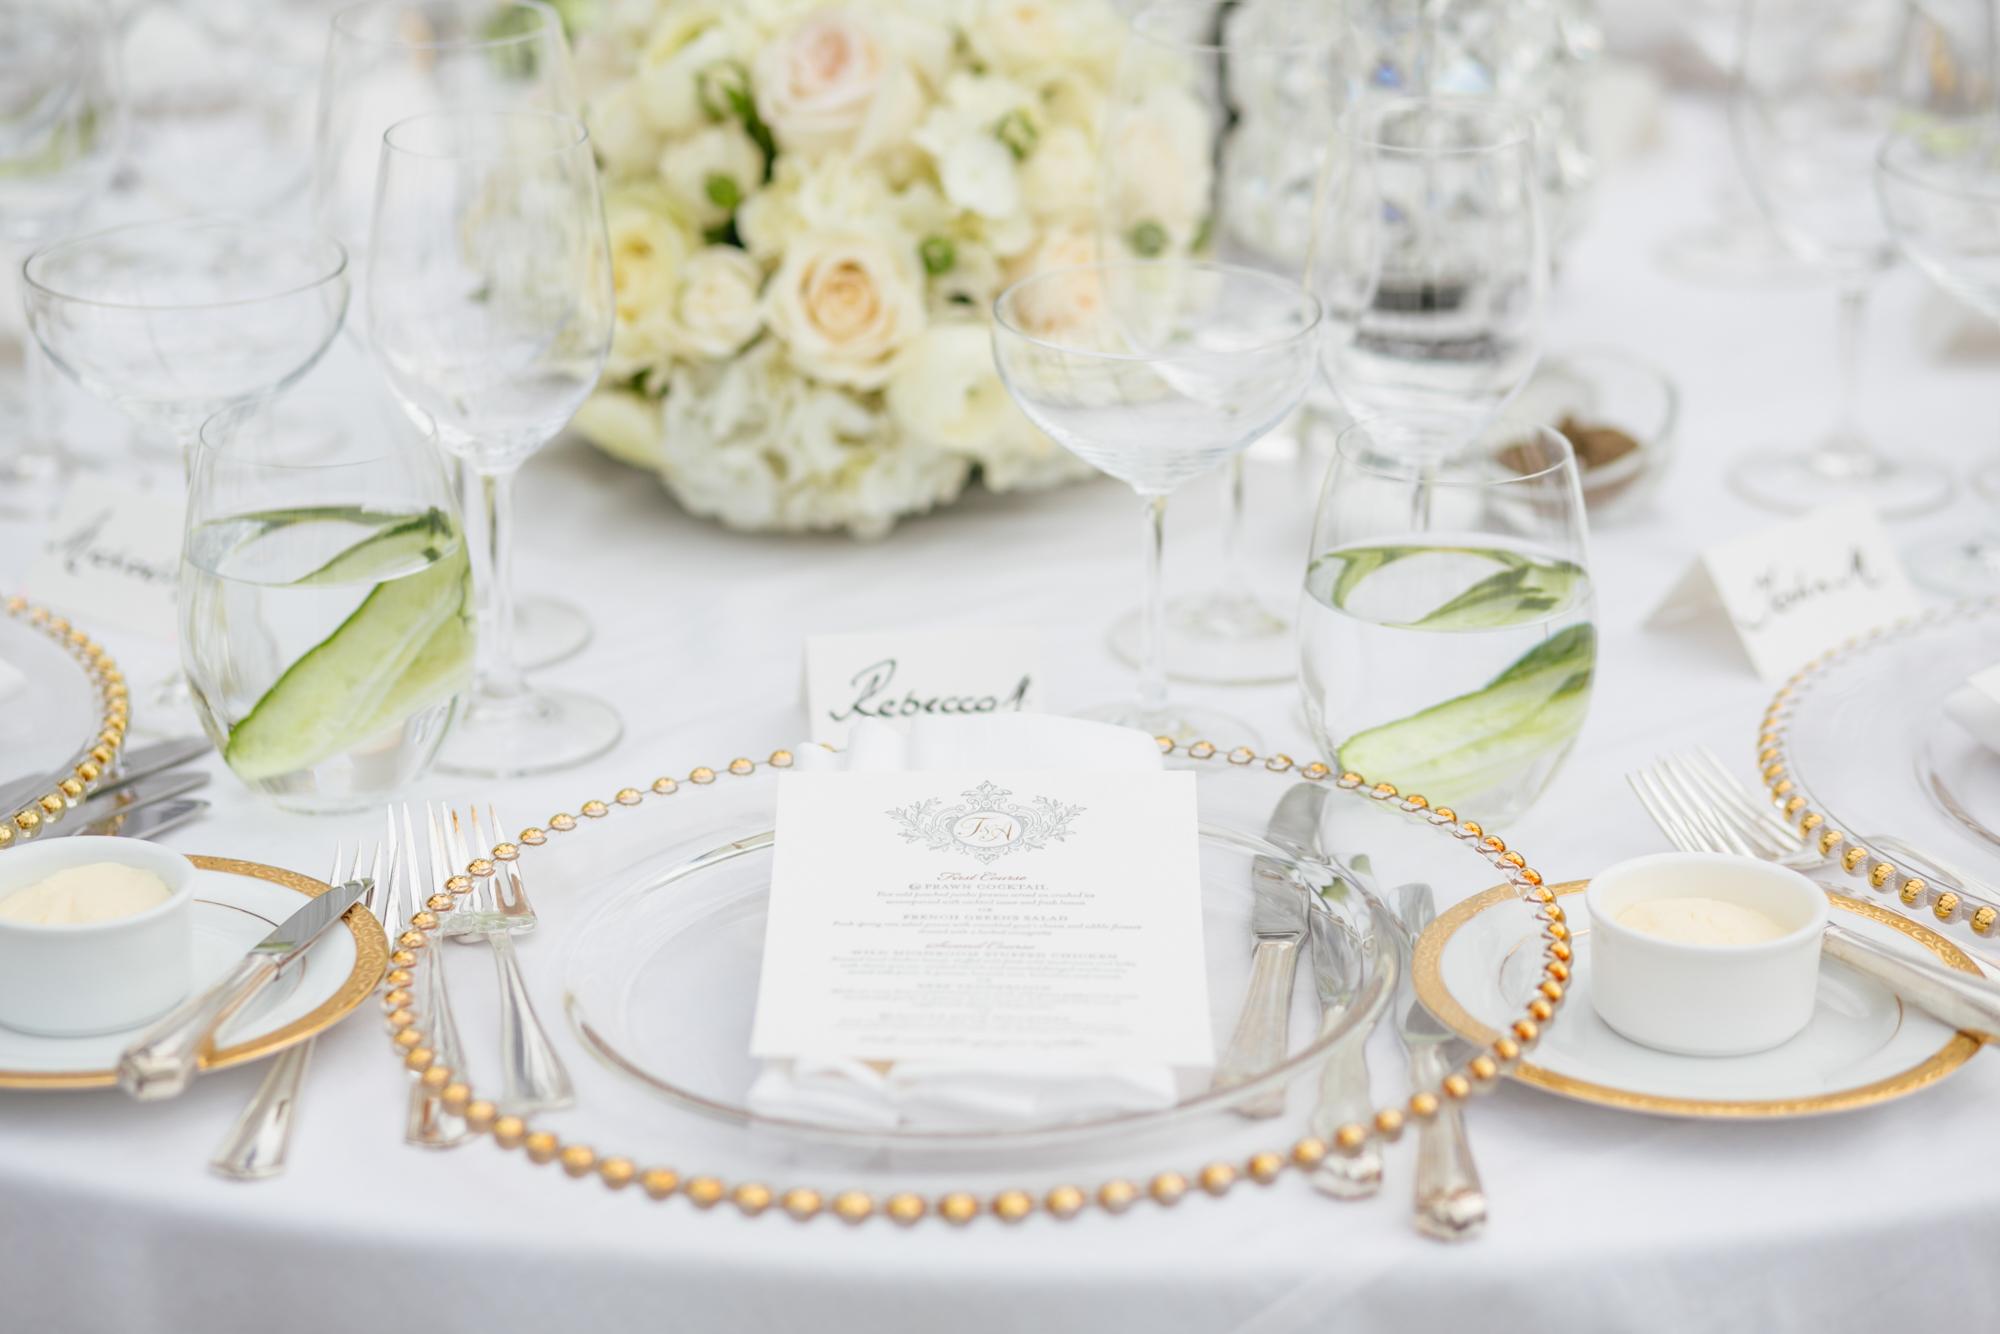 vancouver-luxury-wedding-photographer-lori-miles--22.jpg